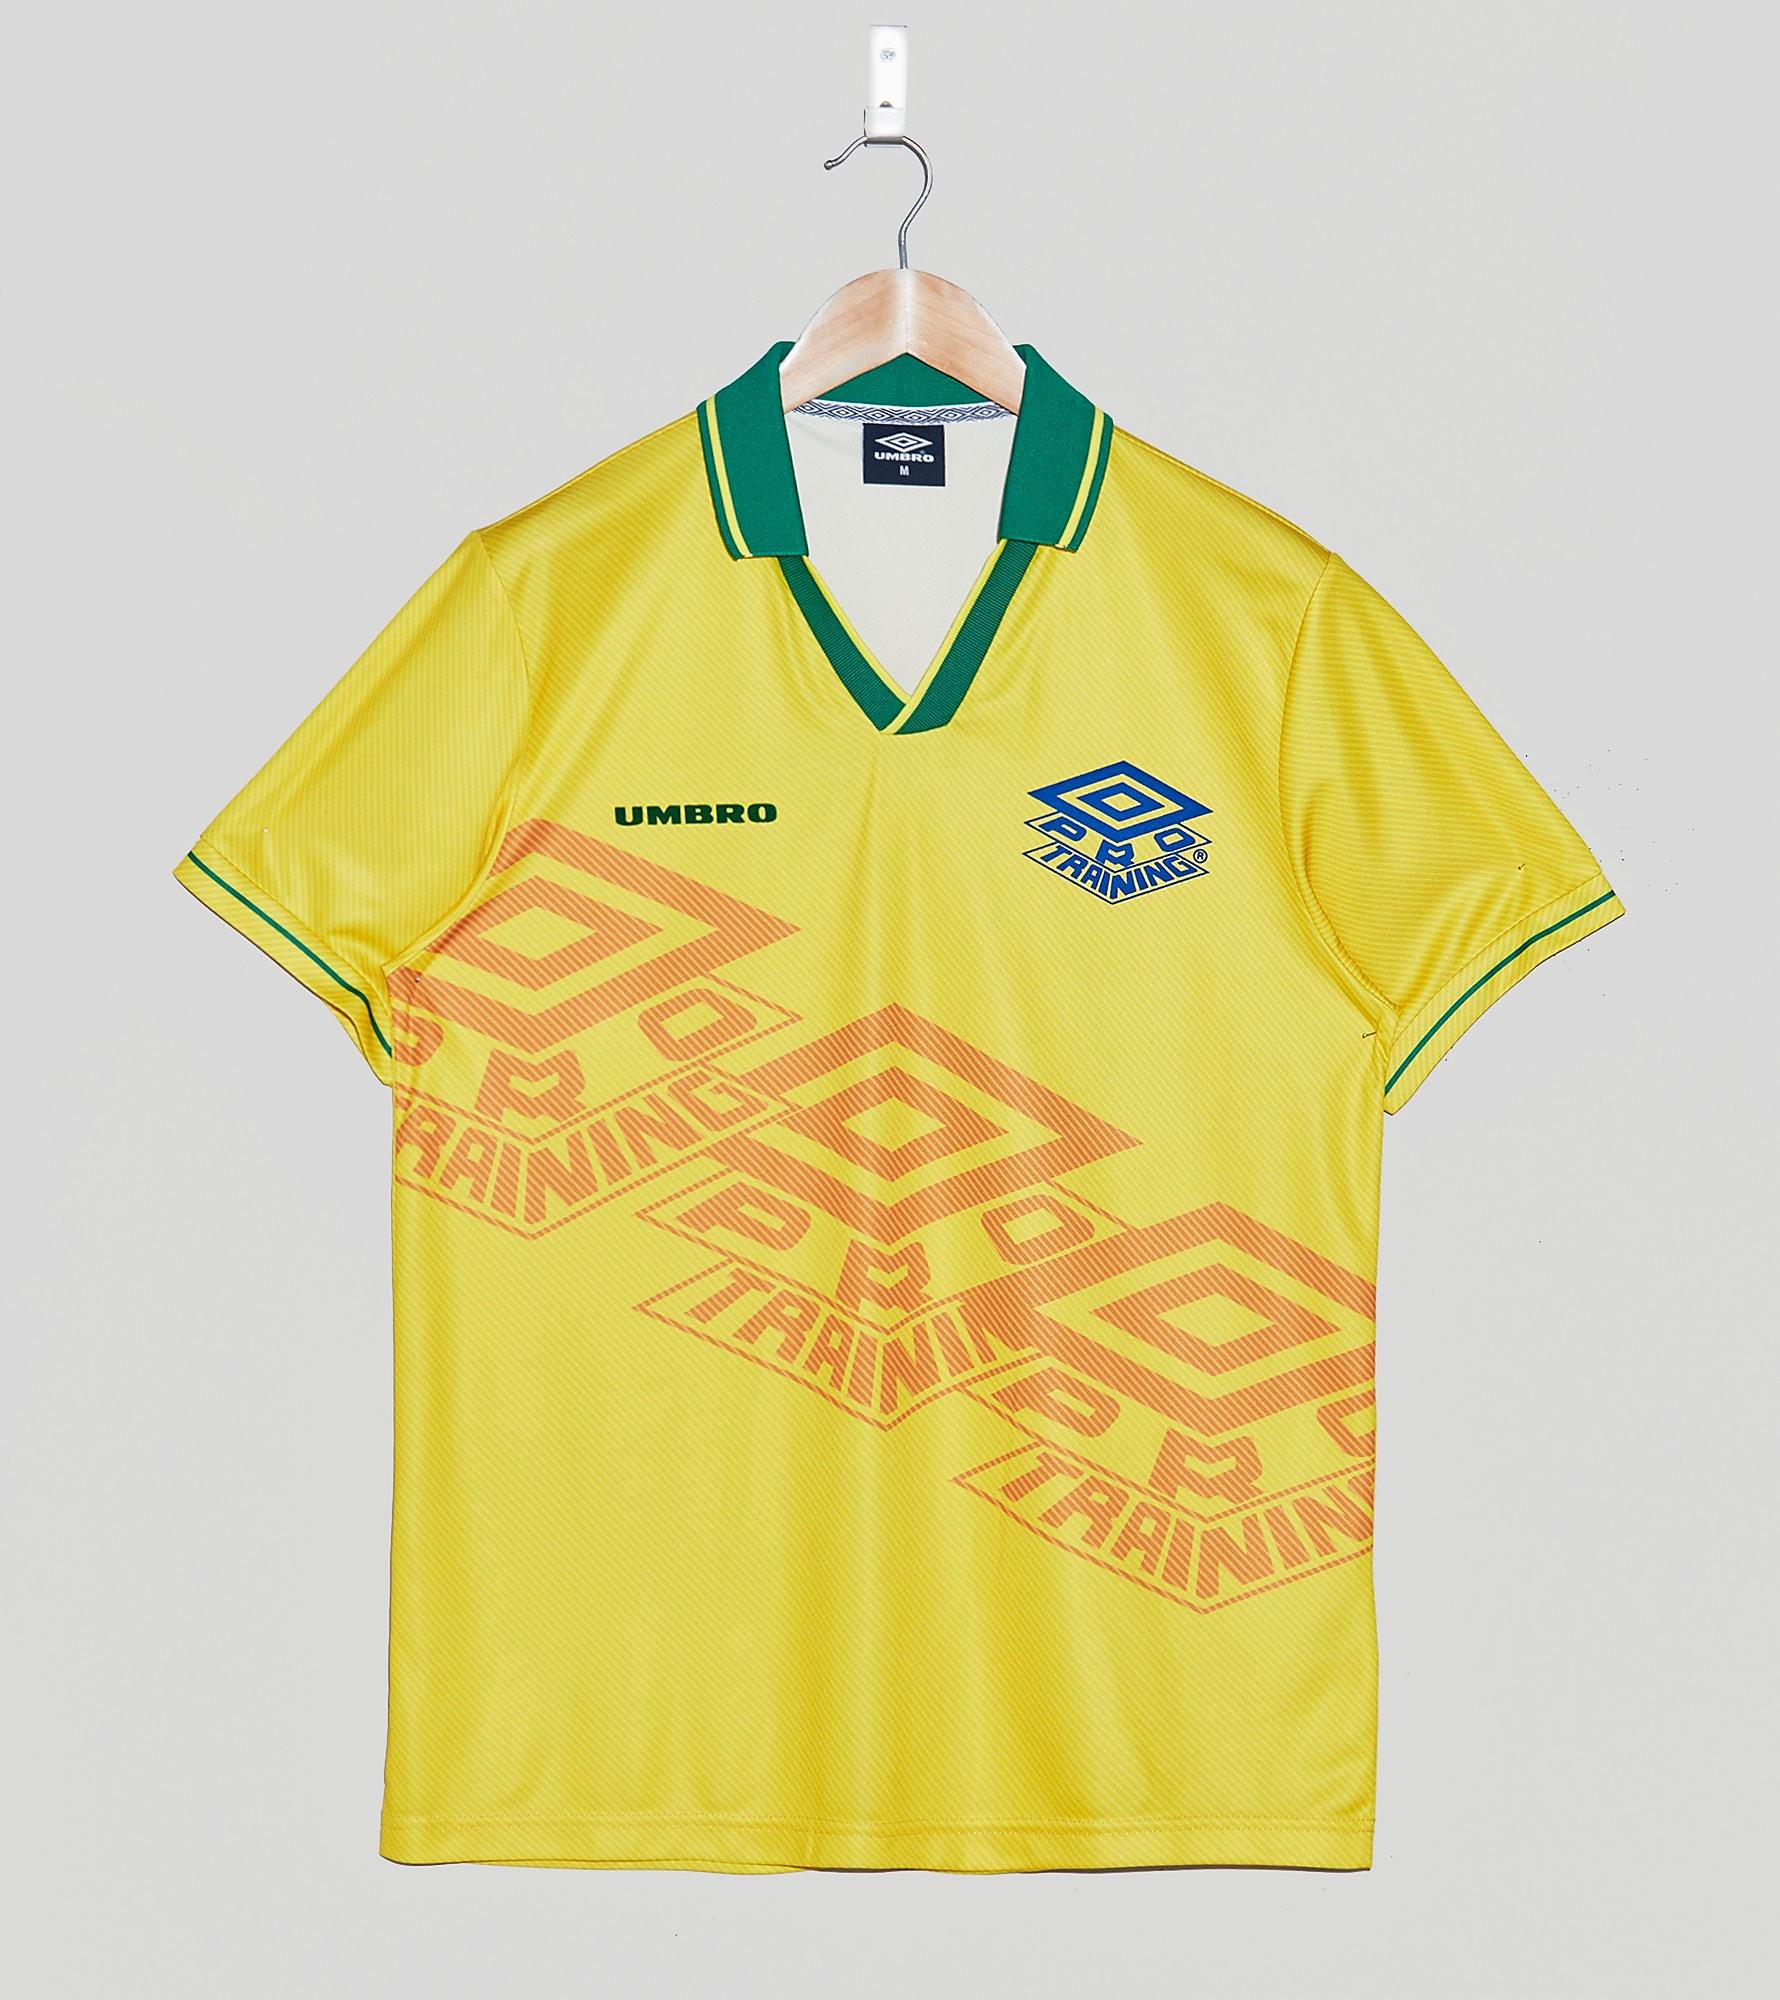 Umbro Brazil Jersey